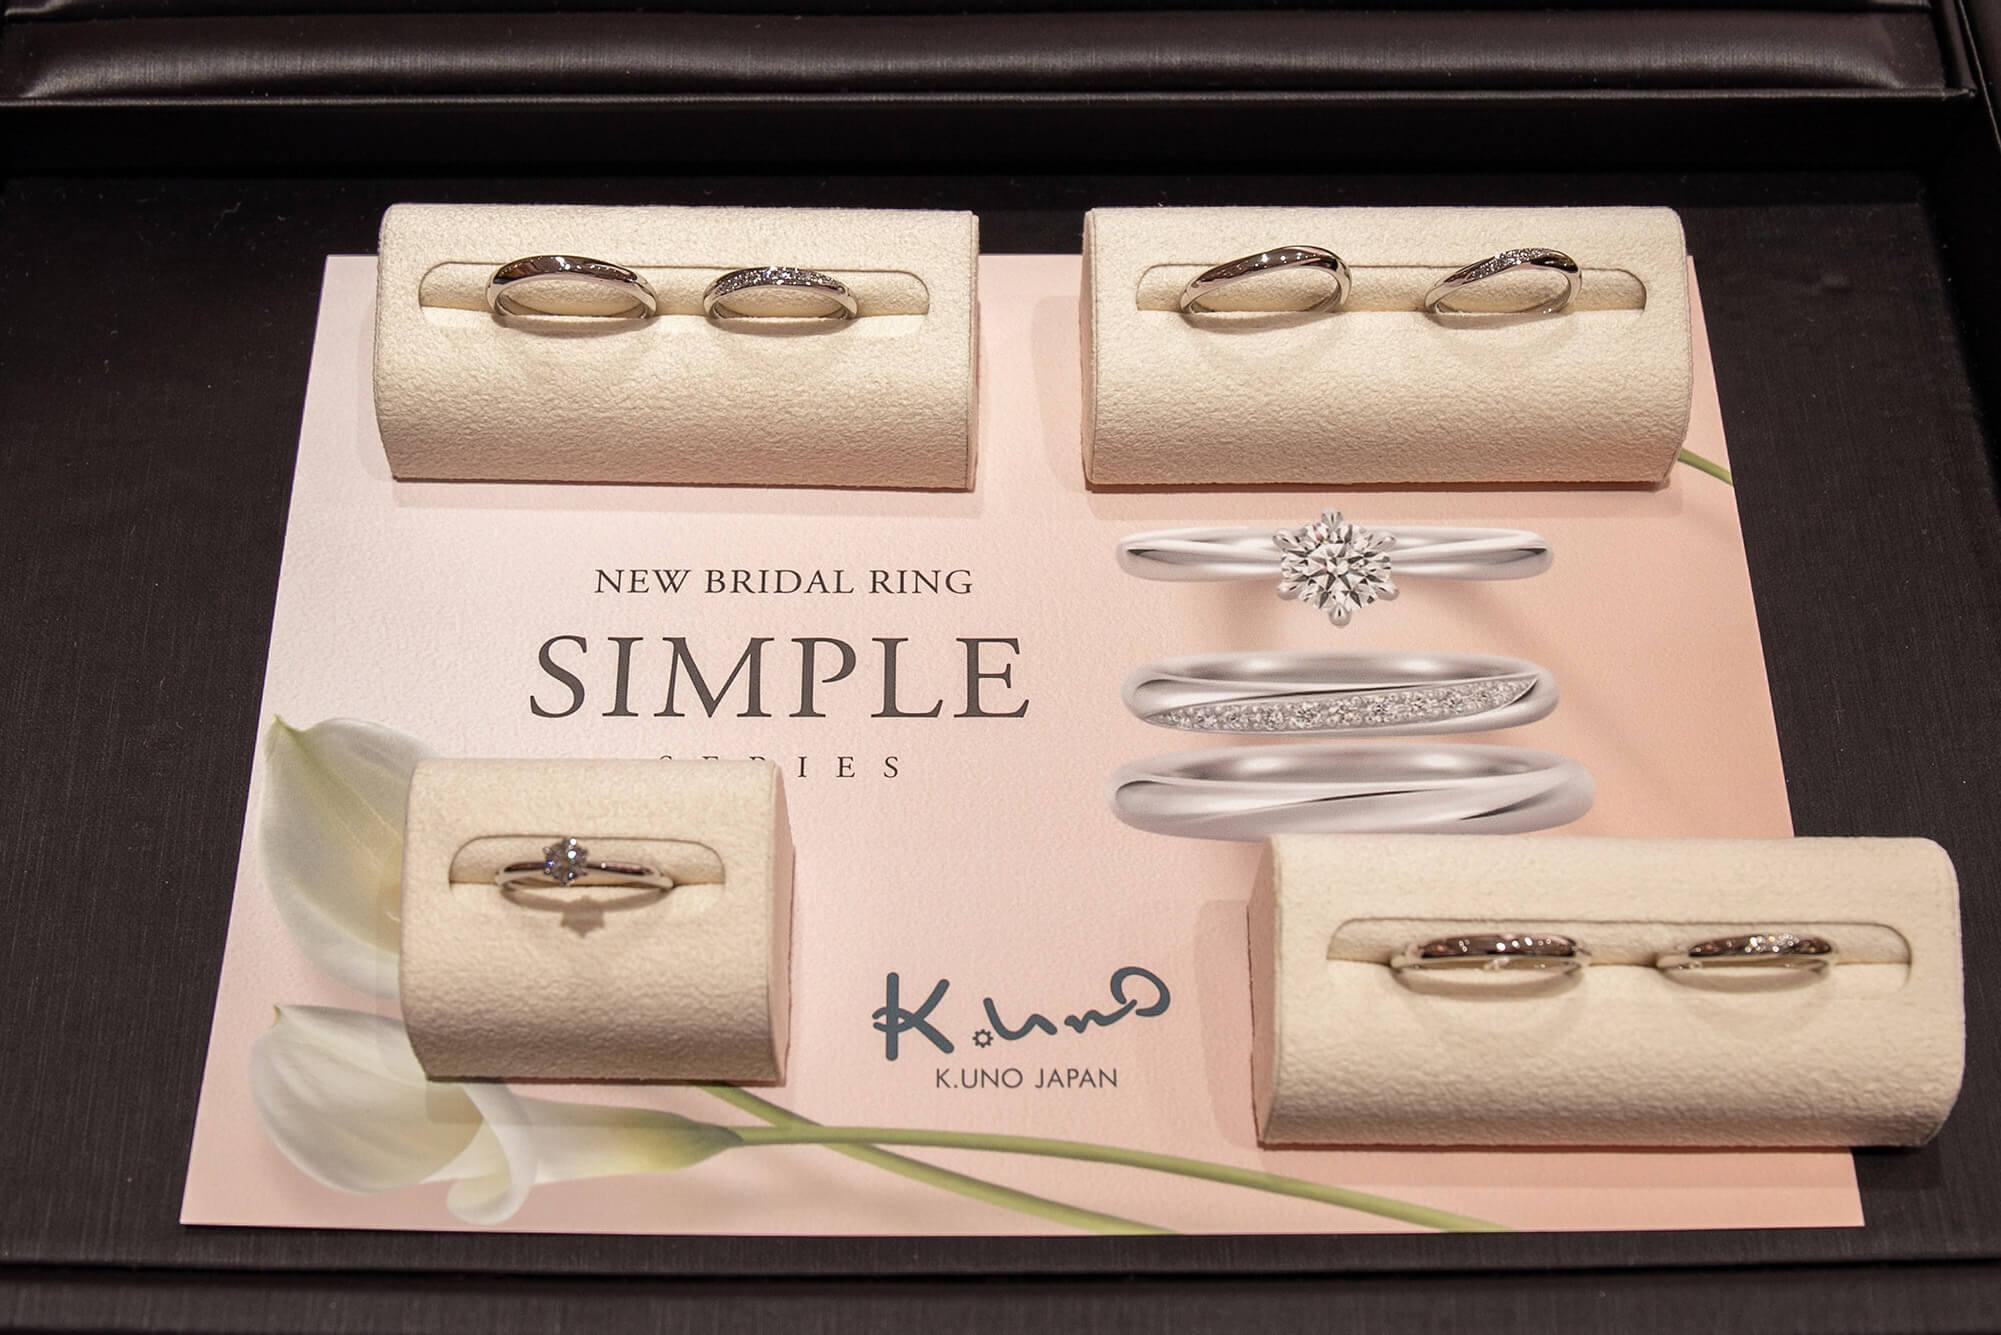 K.uno Japan南西館SIMPLE系列